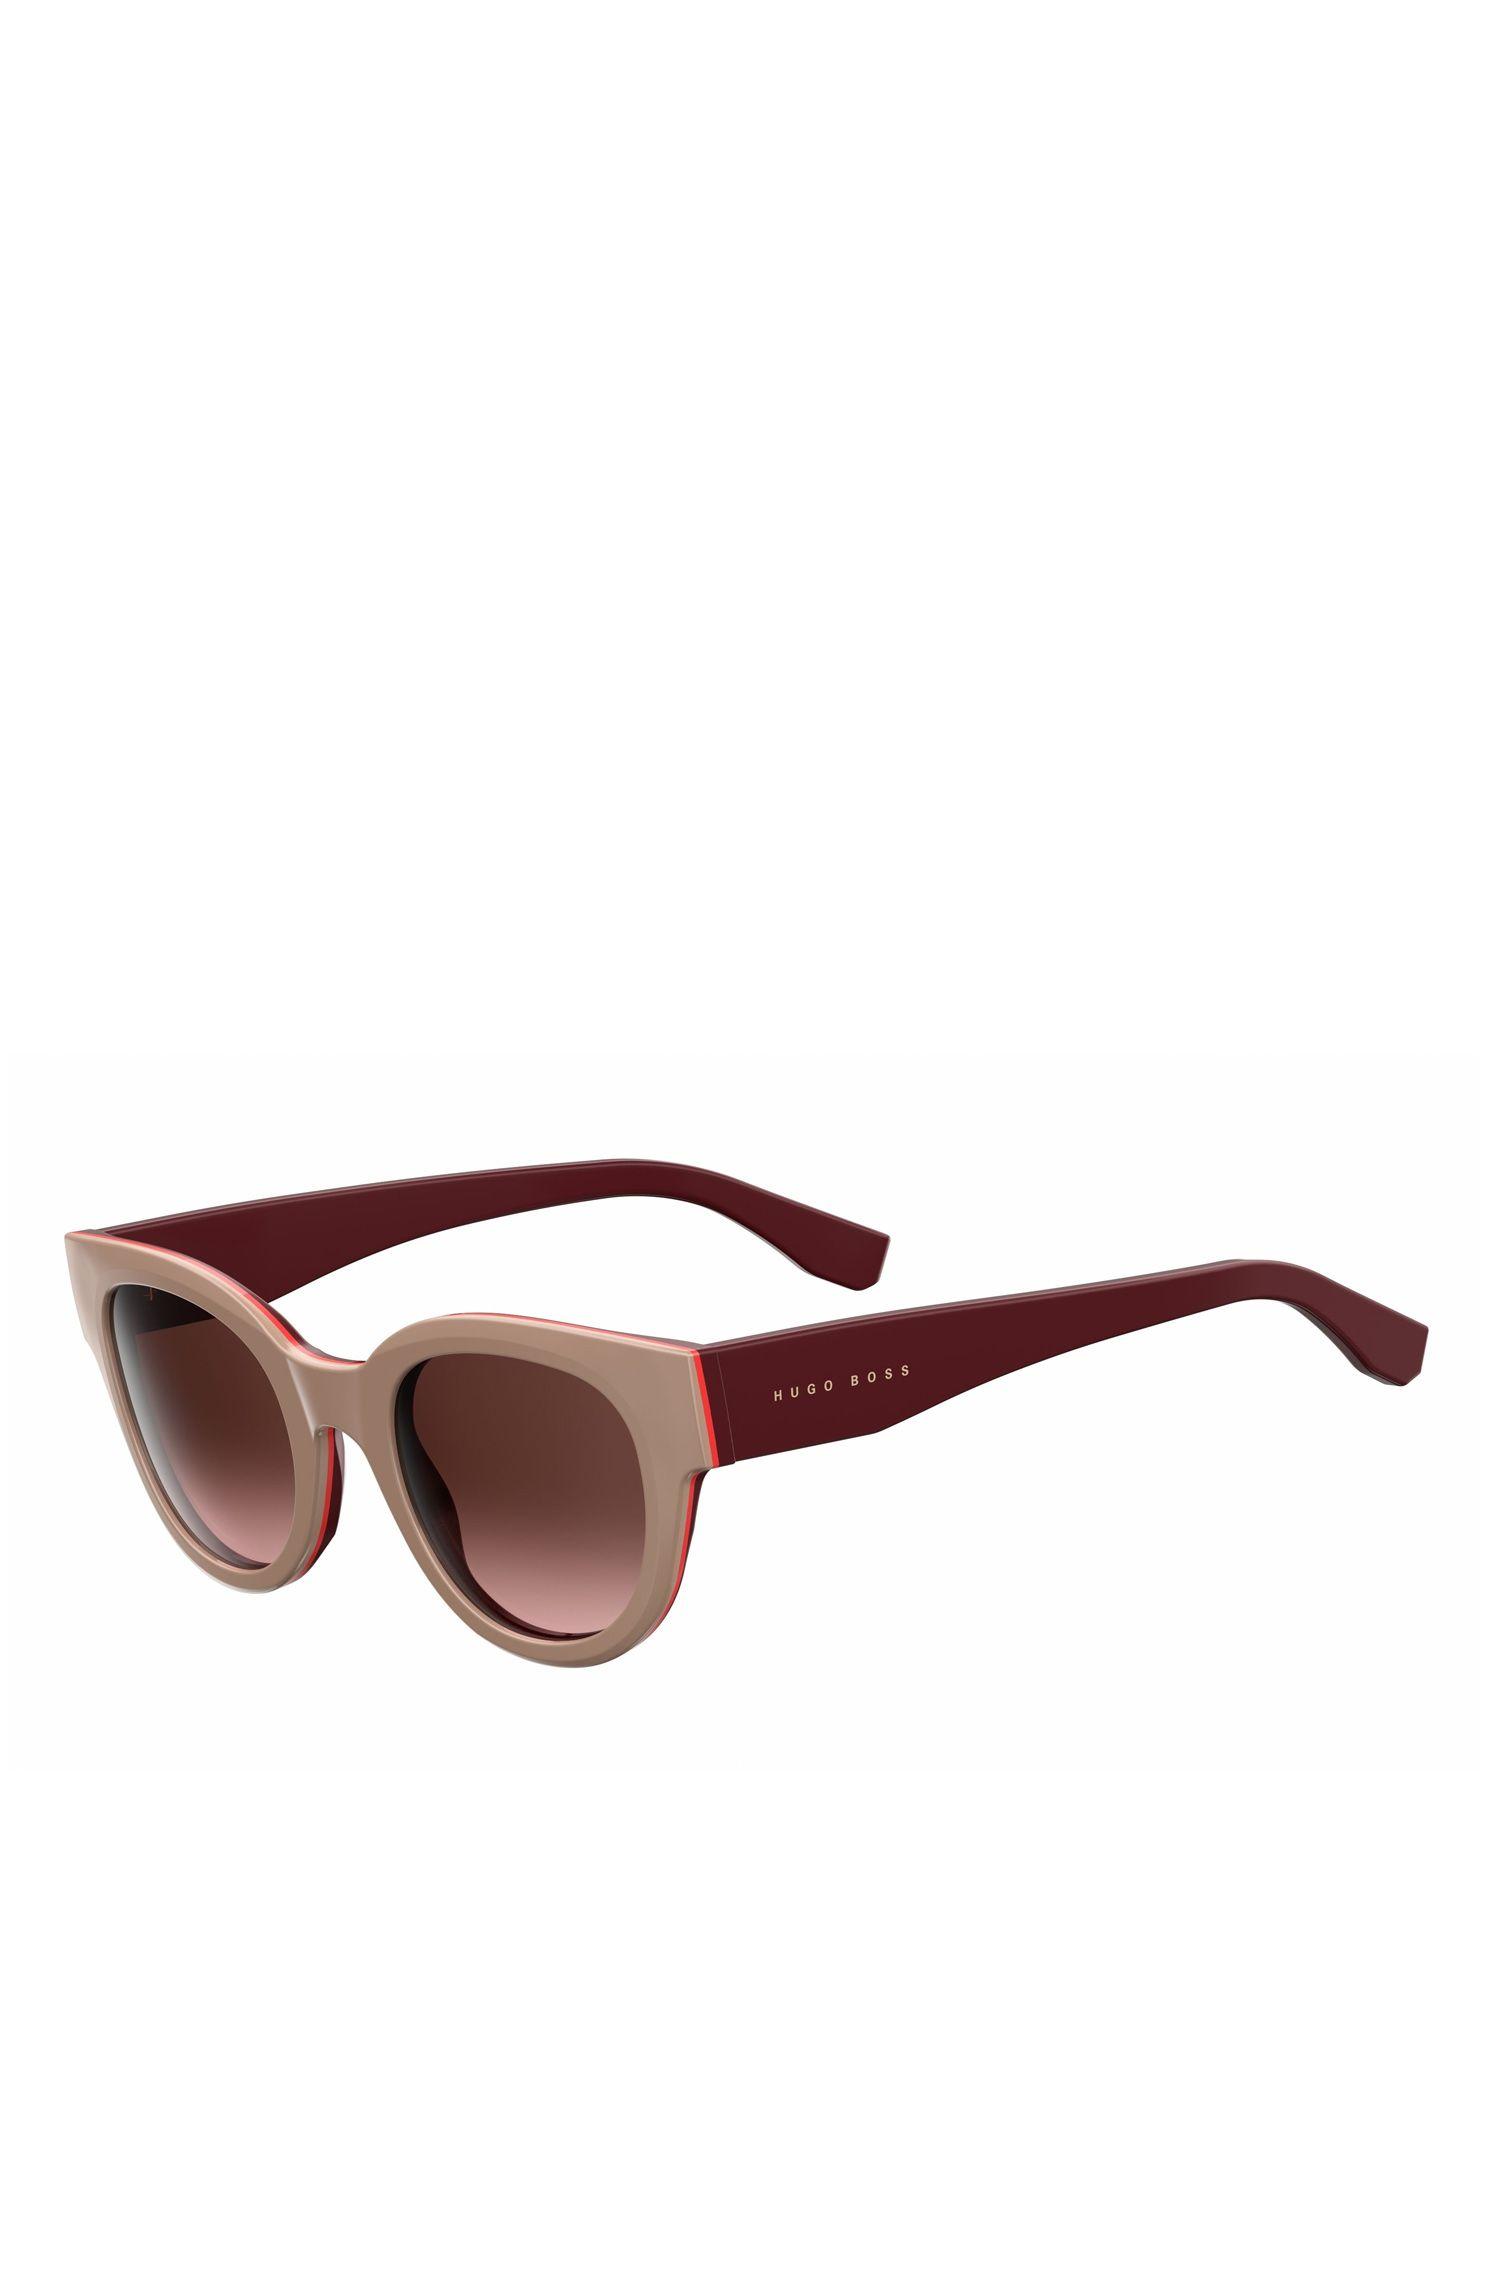 Gradient Lens Block Cat Eye Sunglasses | BOSS 0888S